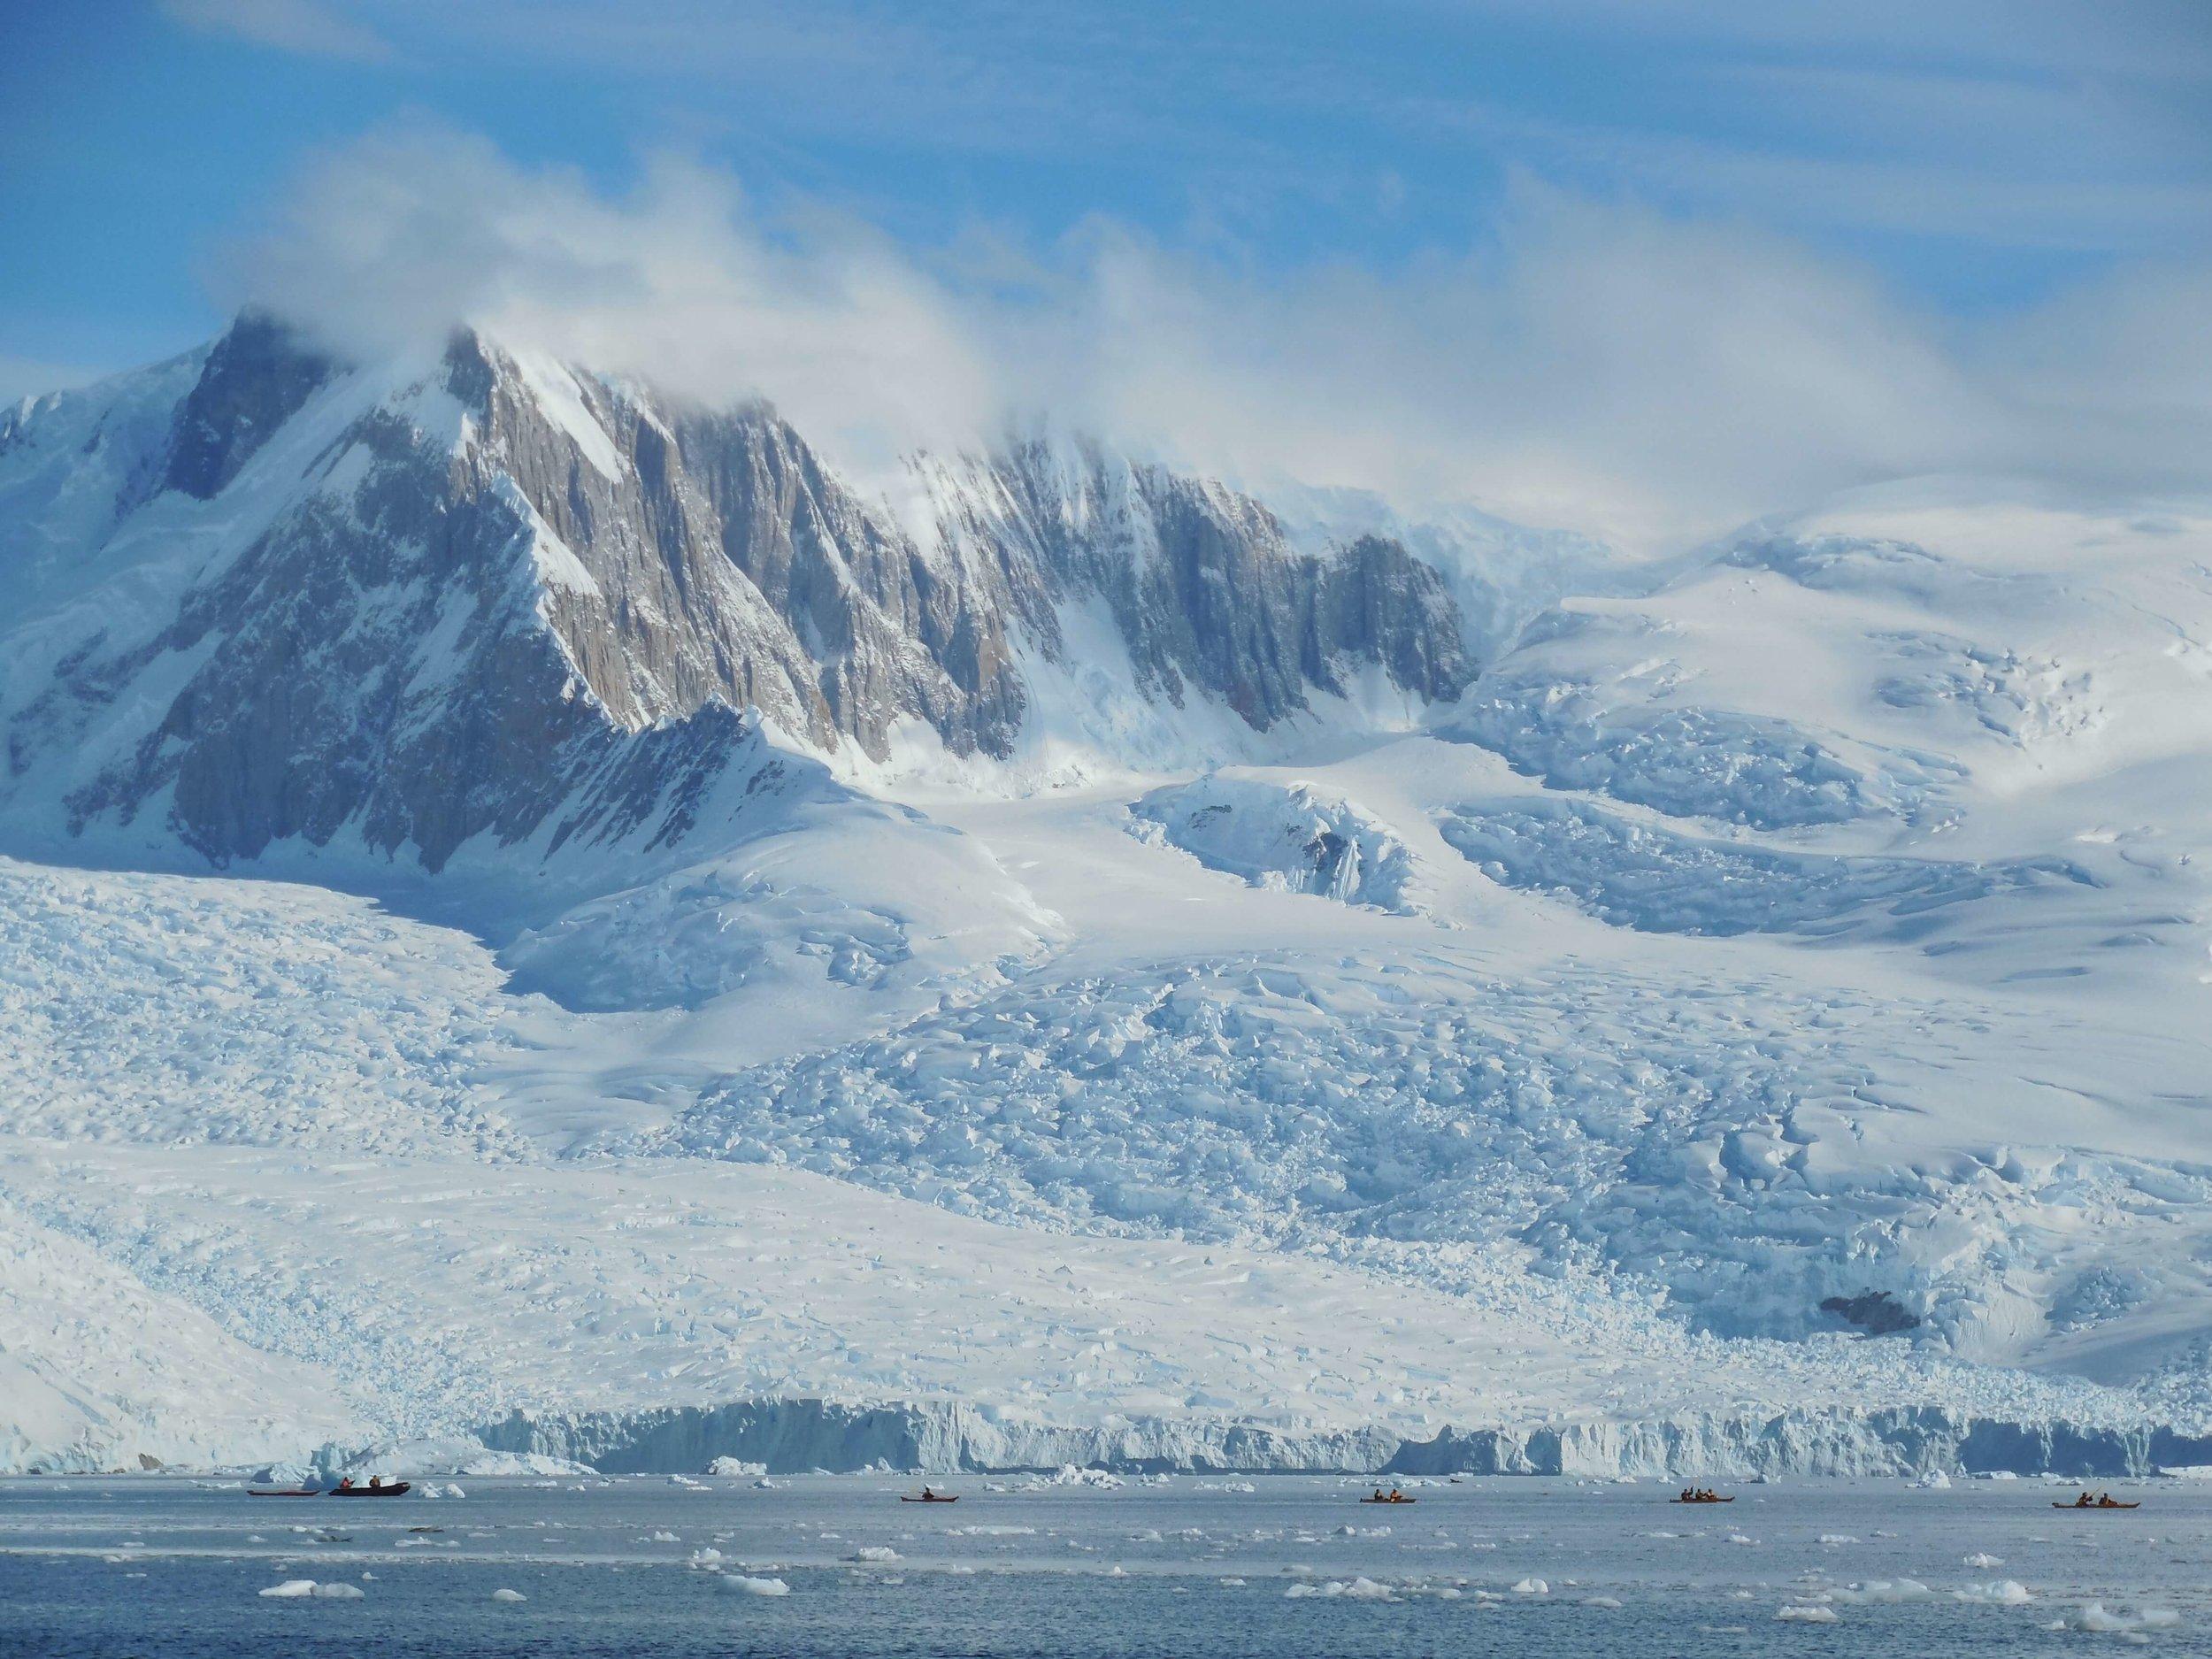 Antarctica_SharedPhotos_20120201_144502_114.JPG